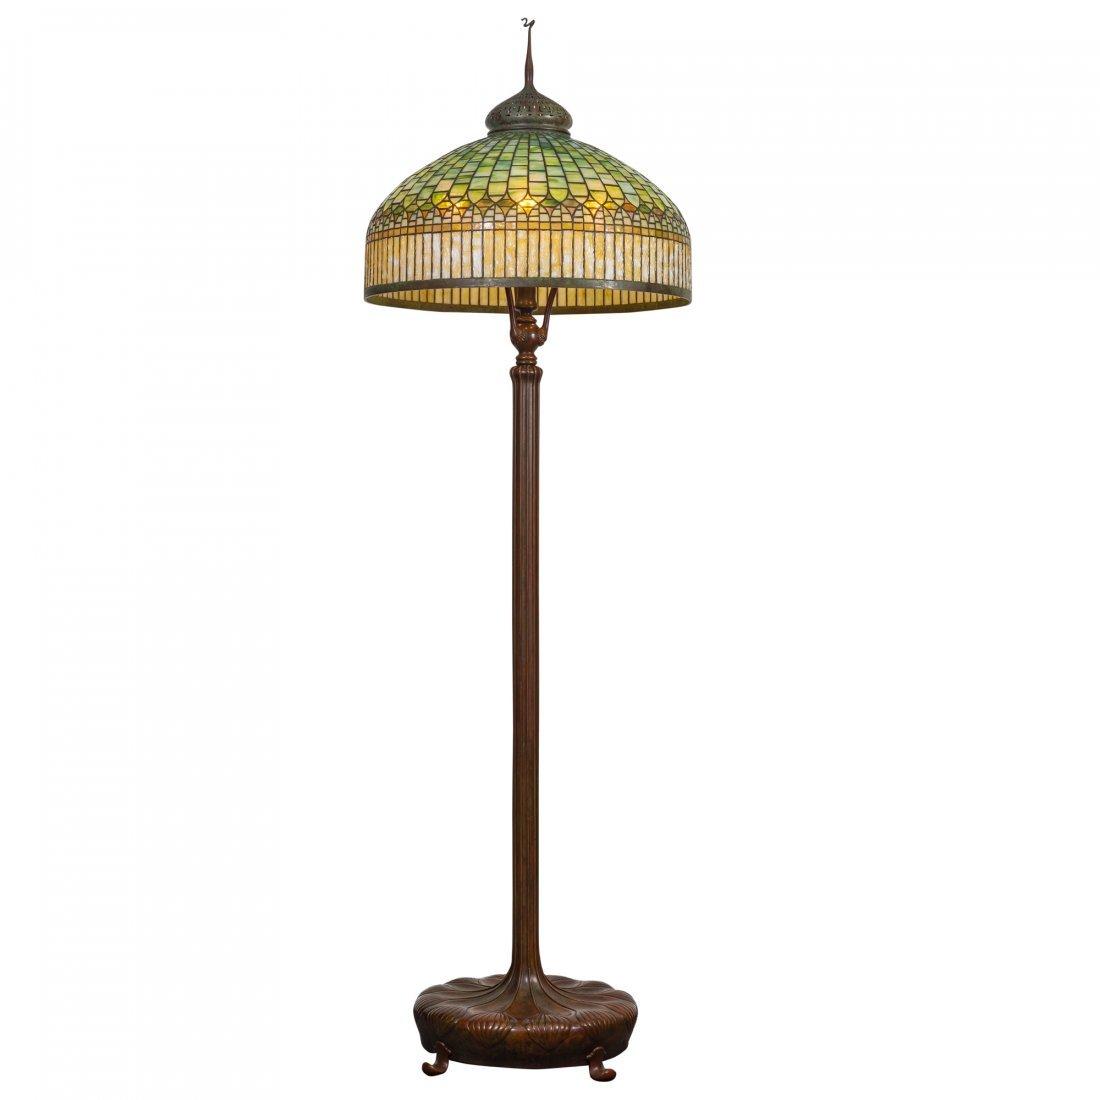 Very Fine Tiffany Curtain Border Floor Lamp